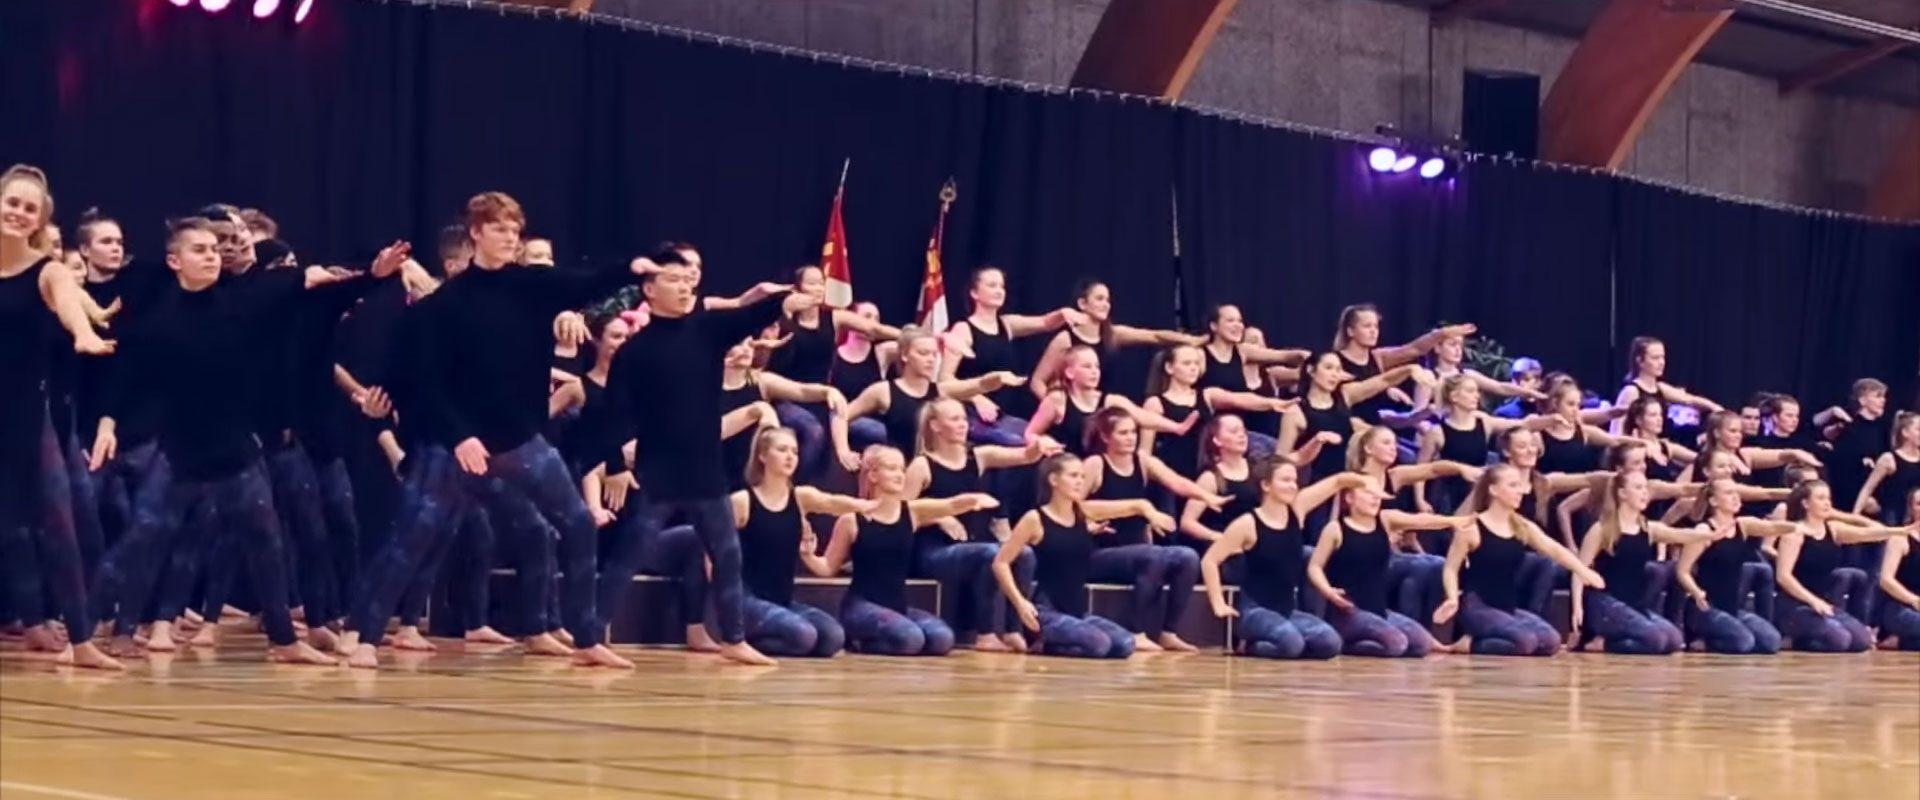 Gymnastikopvisning med Sorø Gymnastikefterskole